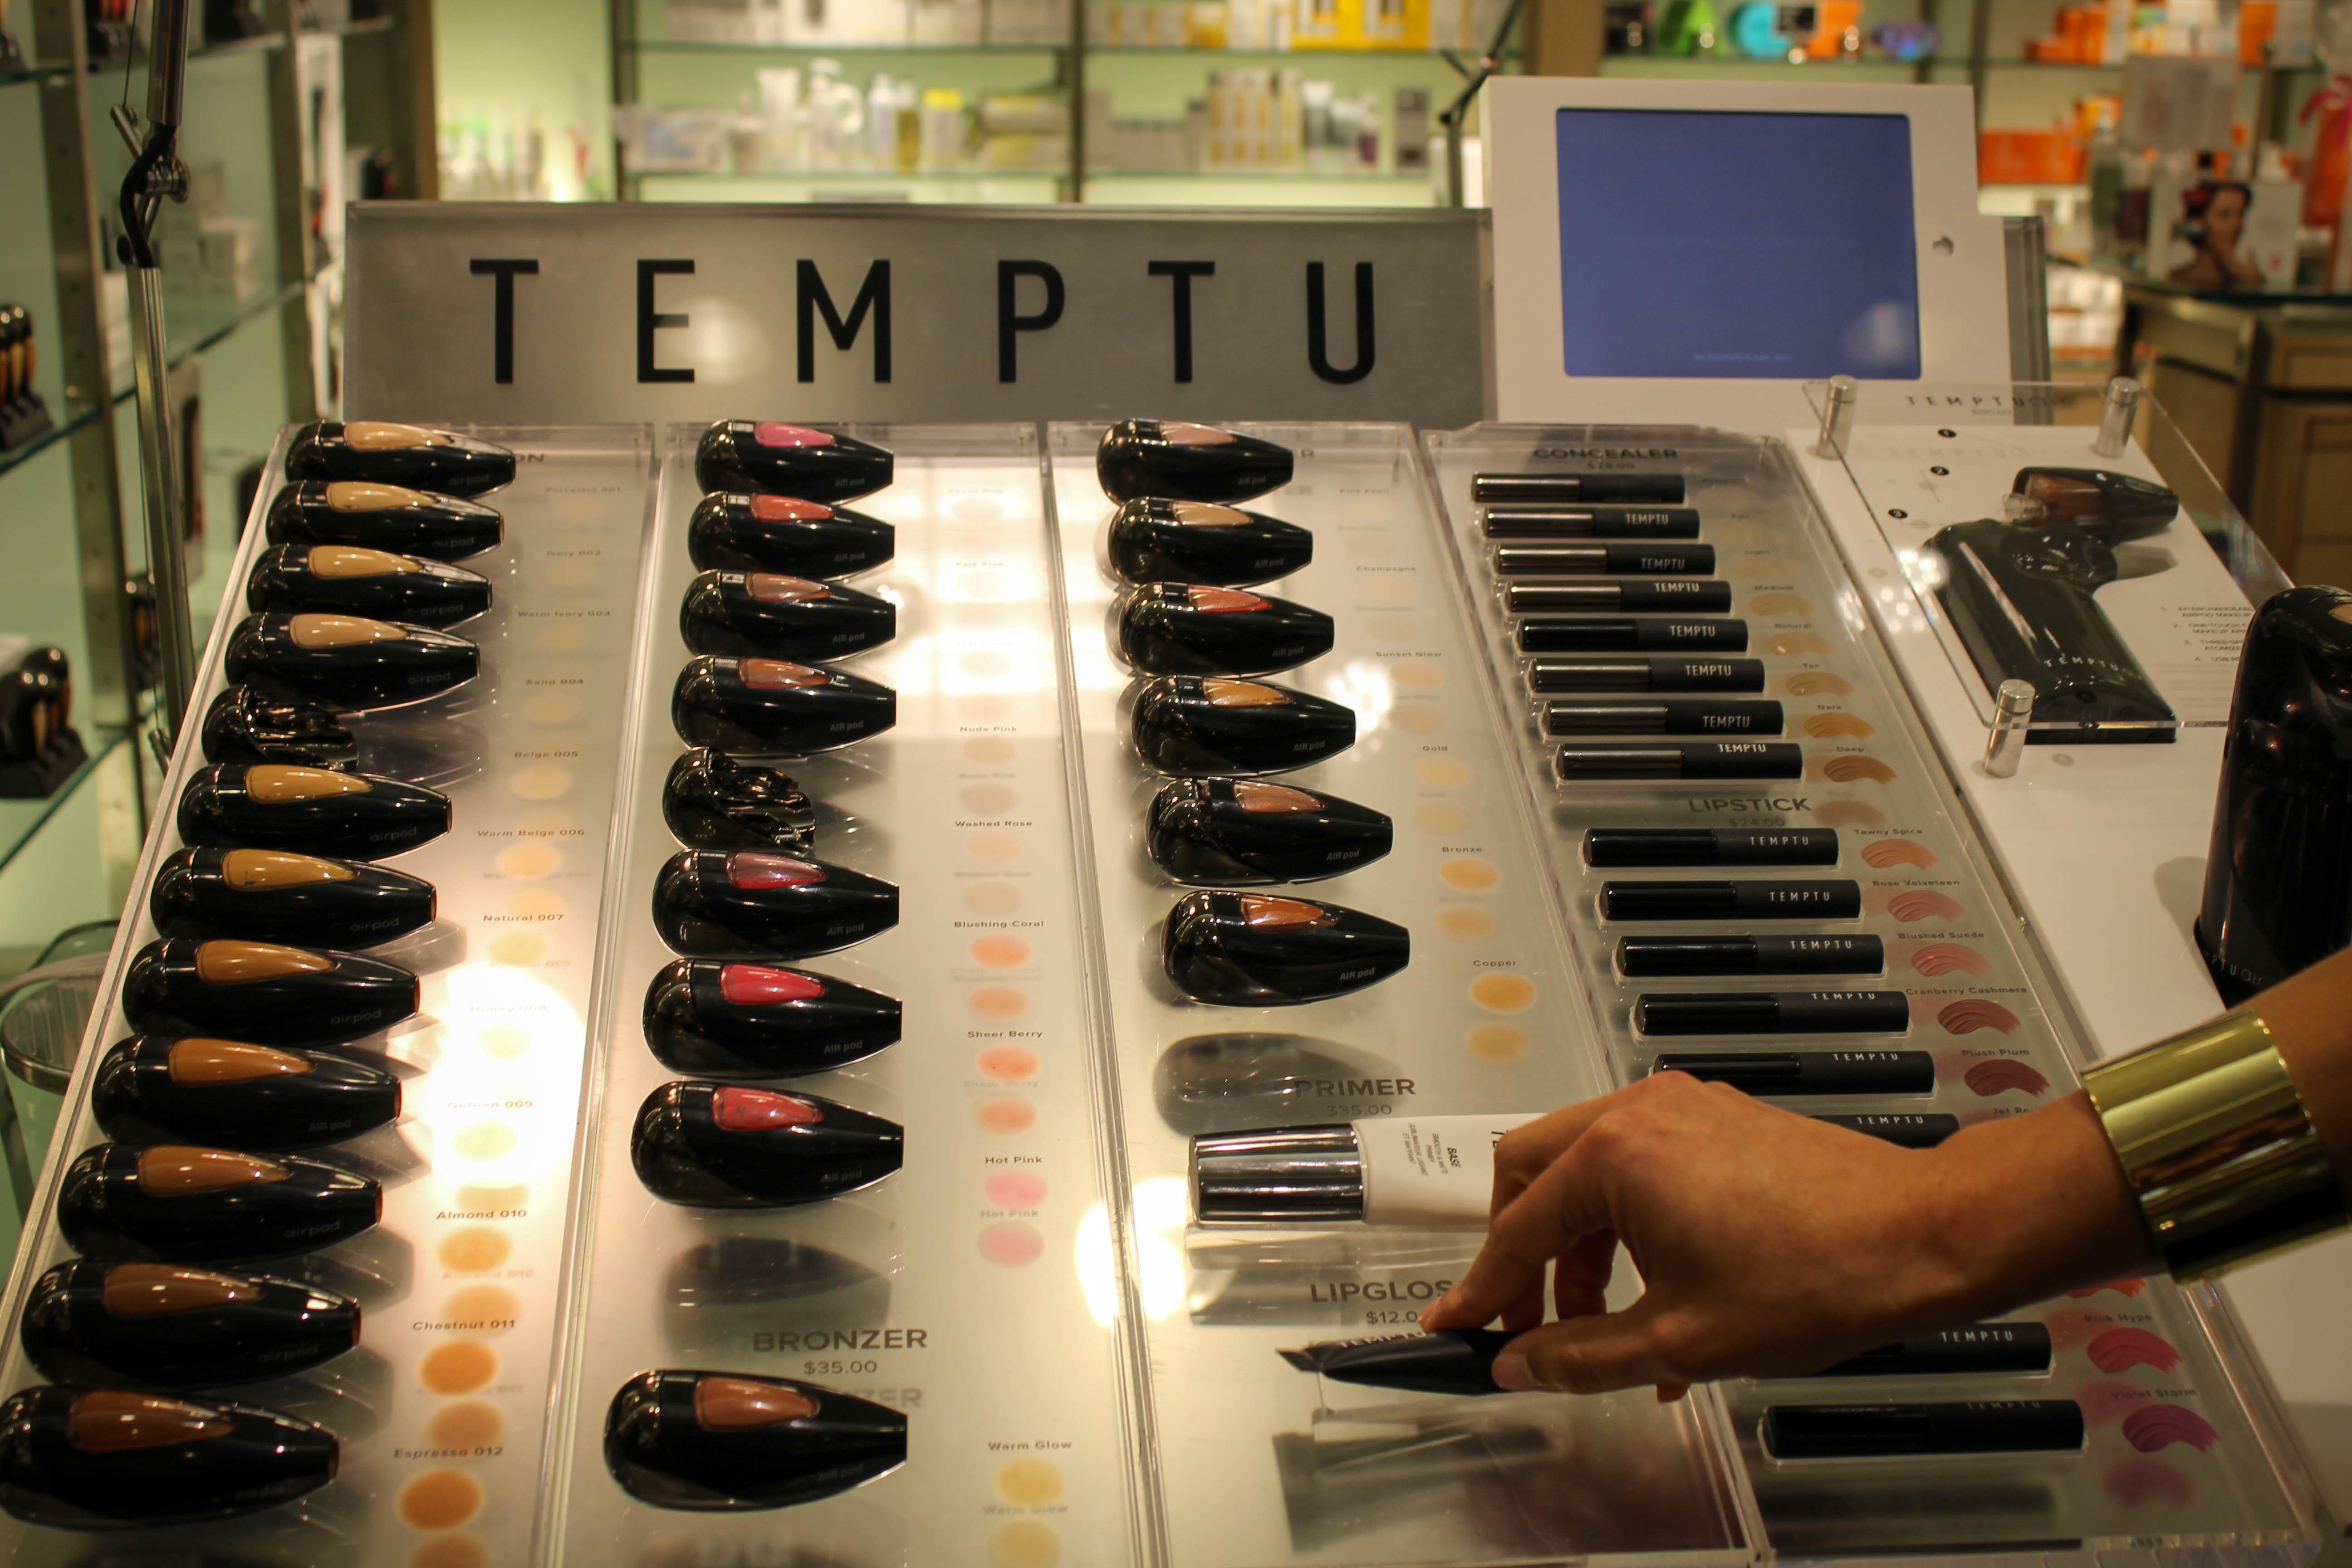 Use airbrush makeup like celebrities: Temptu Air